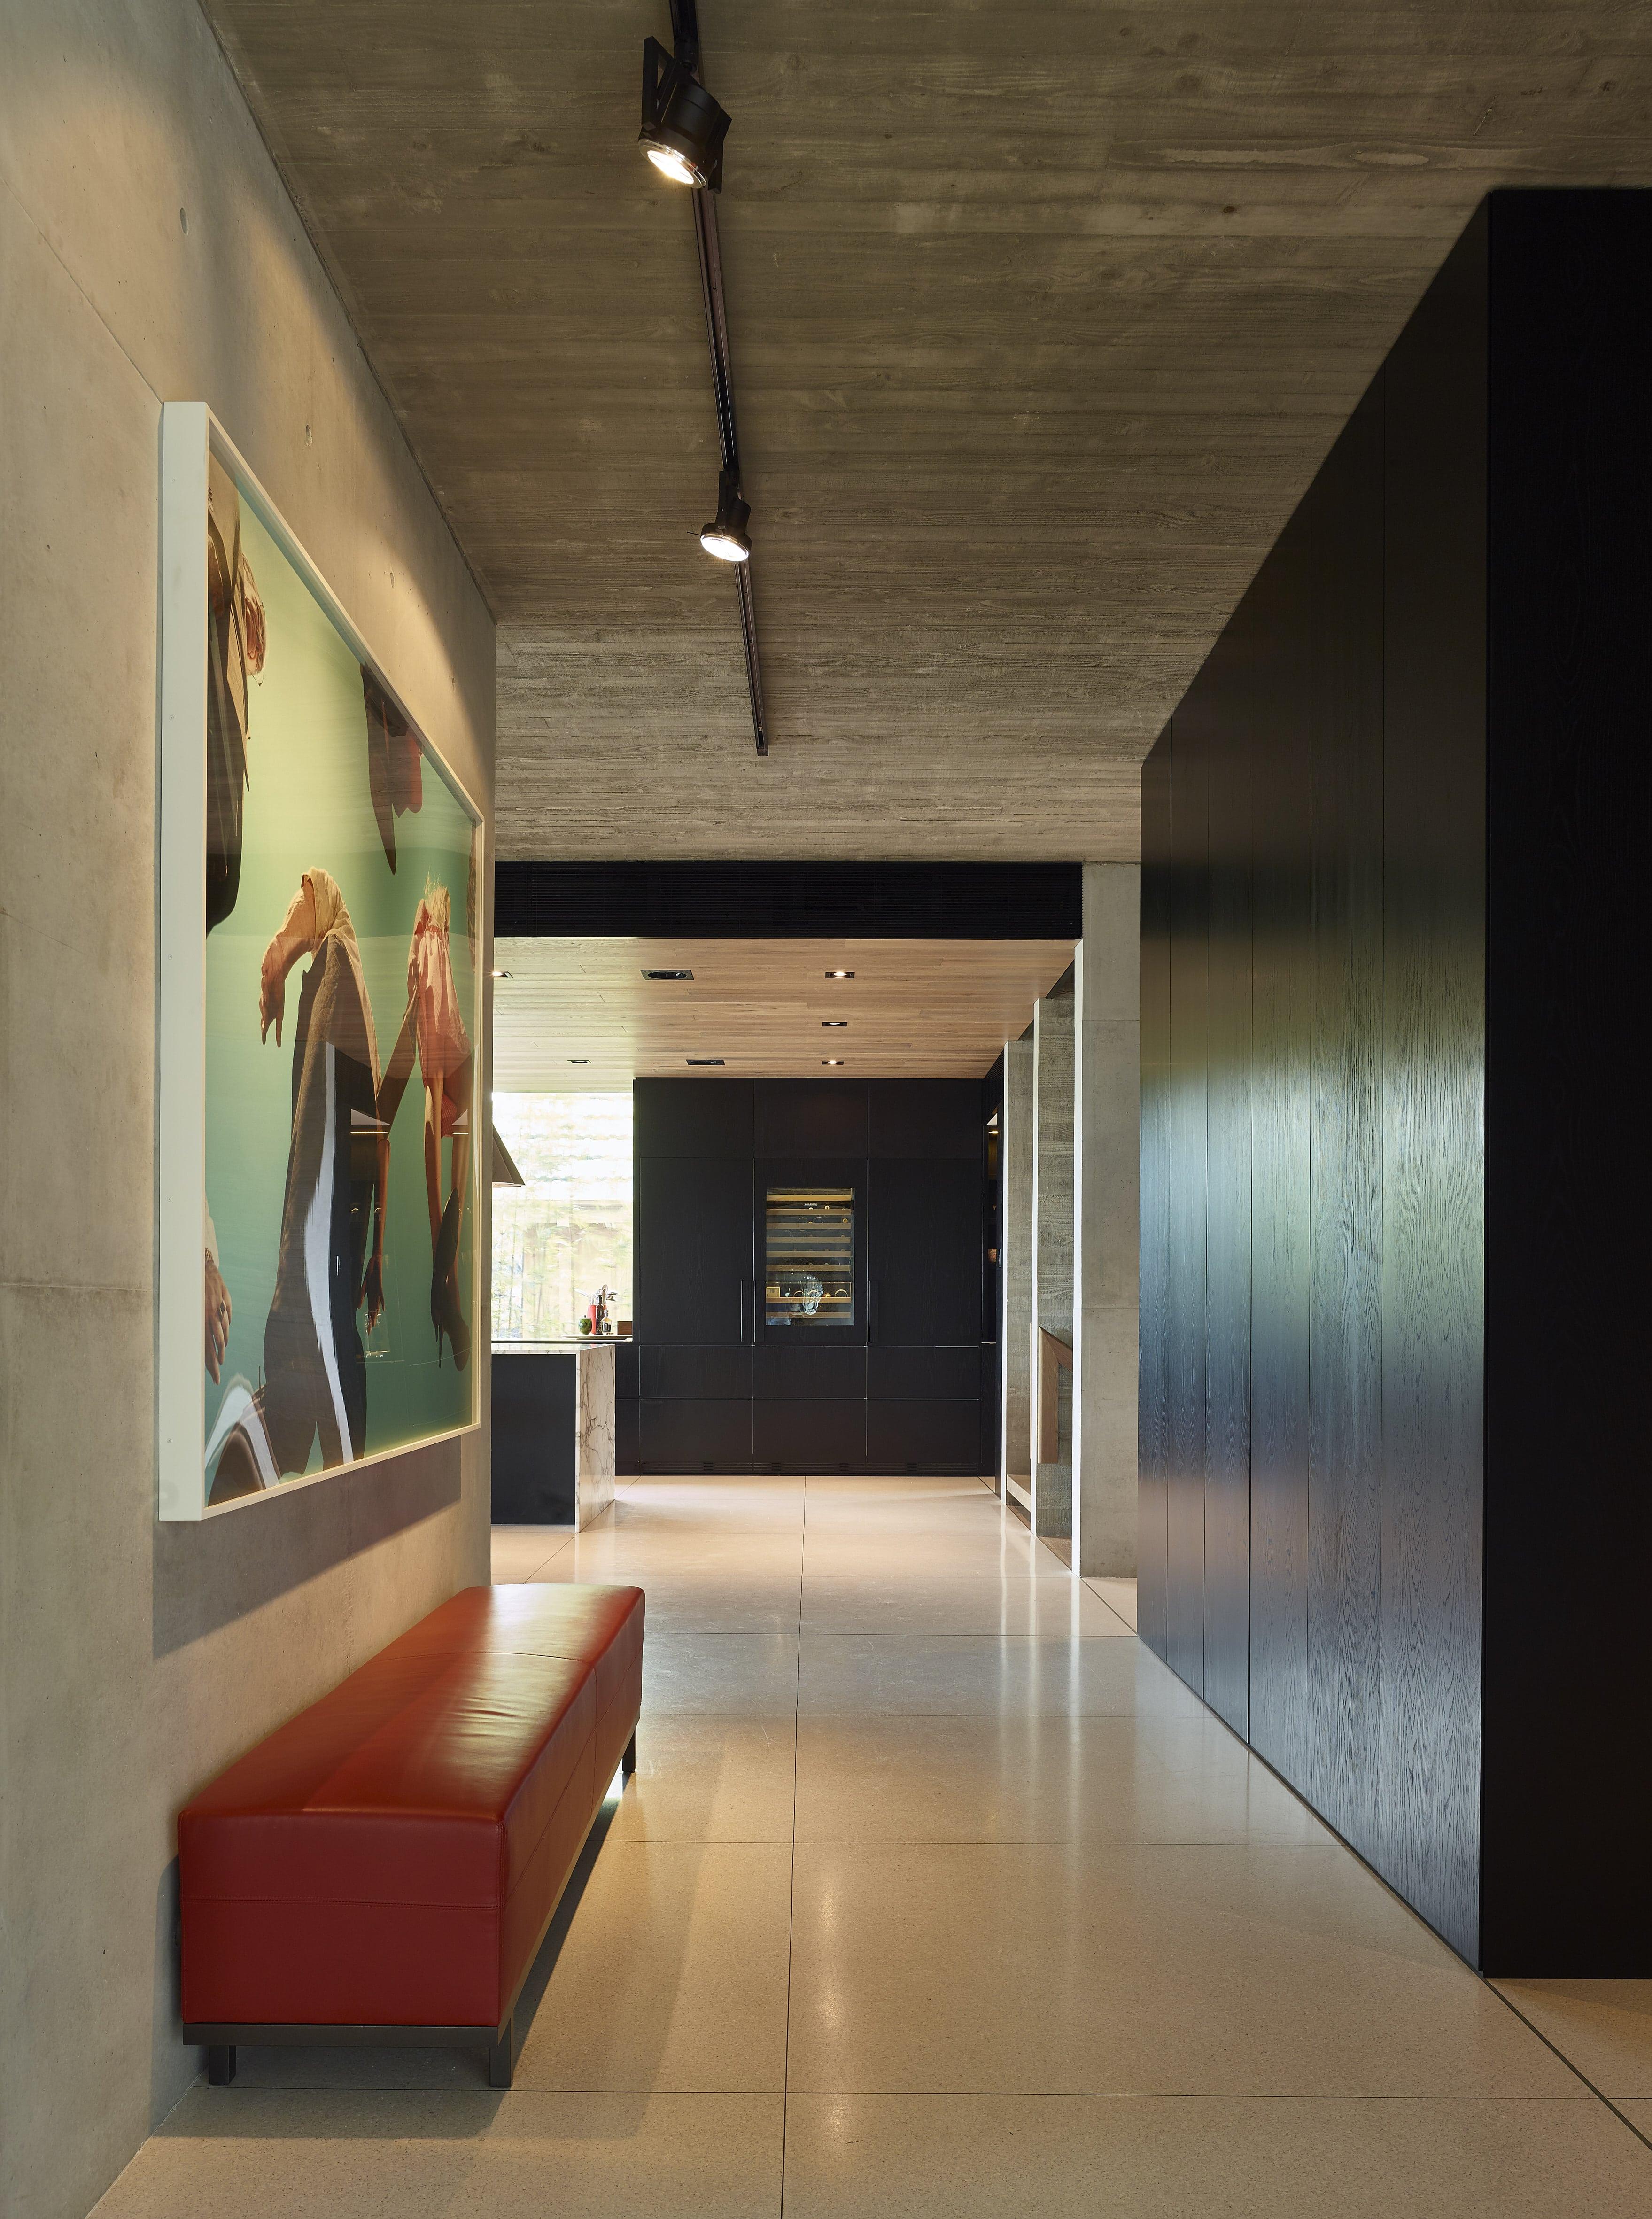 Gallery Of Mosman House By Shaun Lockyer Architects Local Australian Design And Interiors Mosman, Nsw Image 17 Min